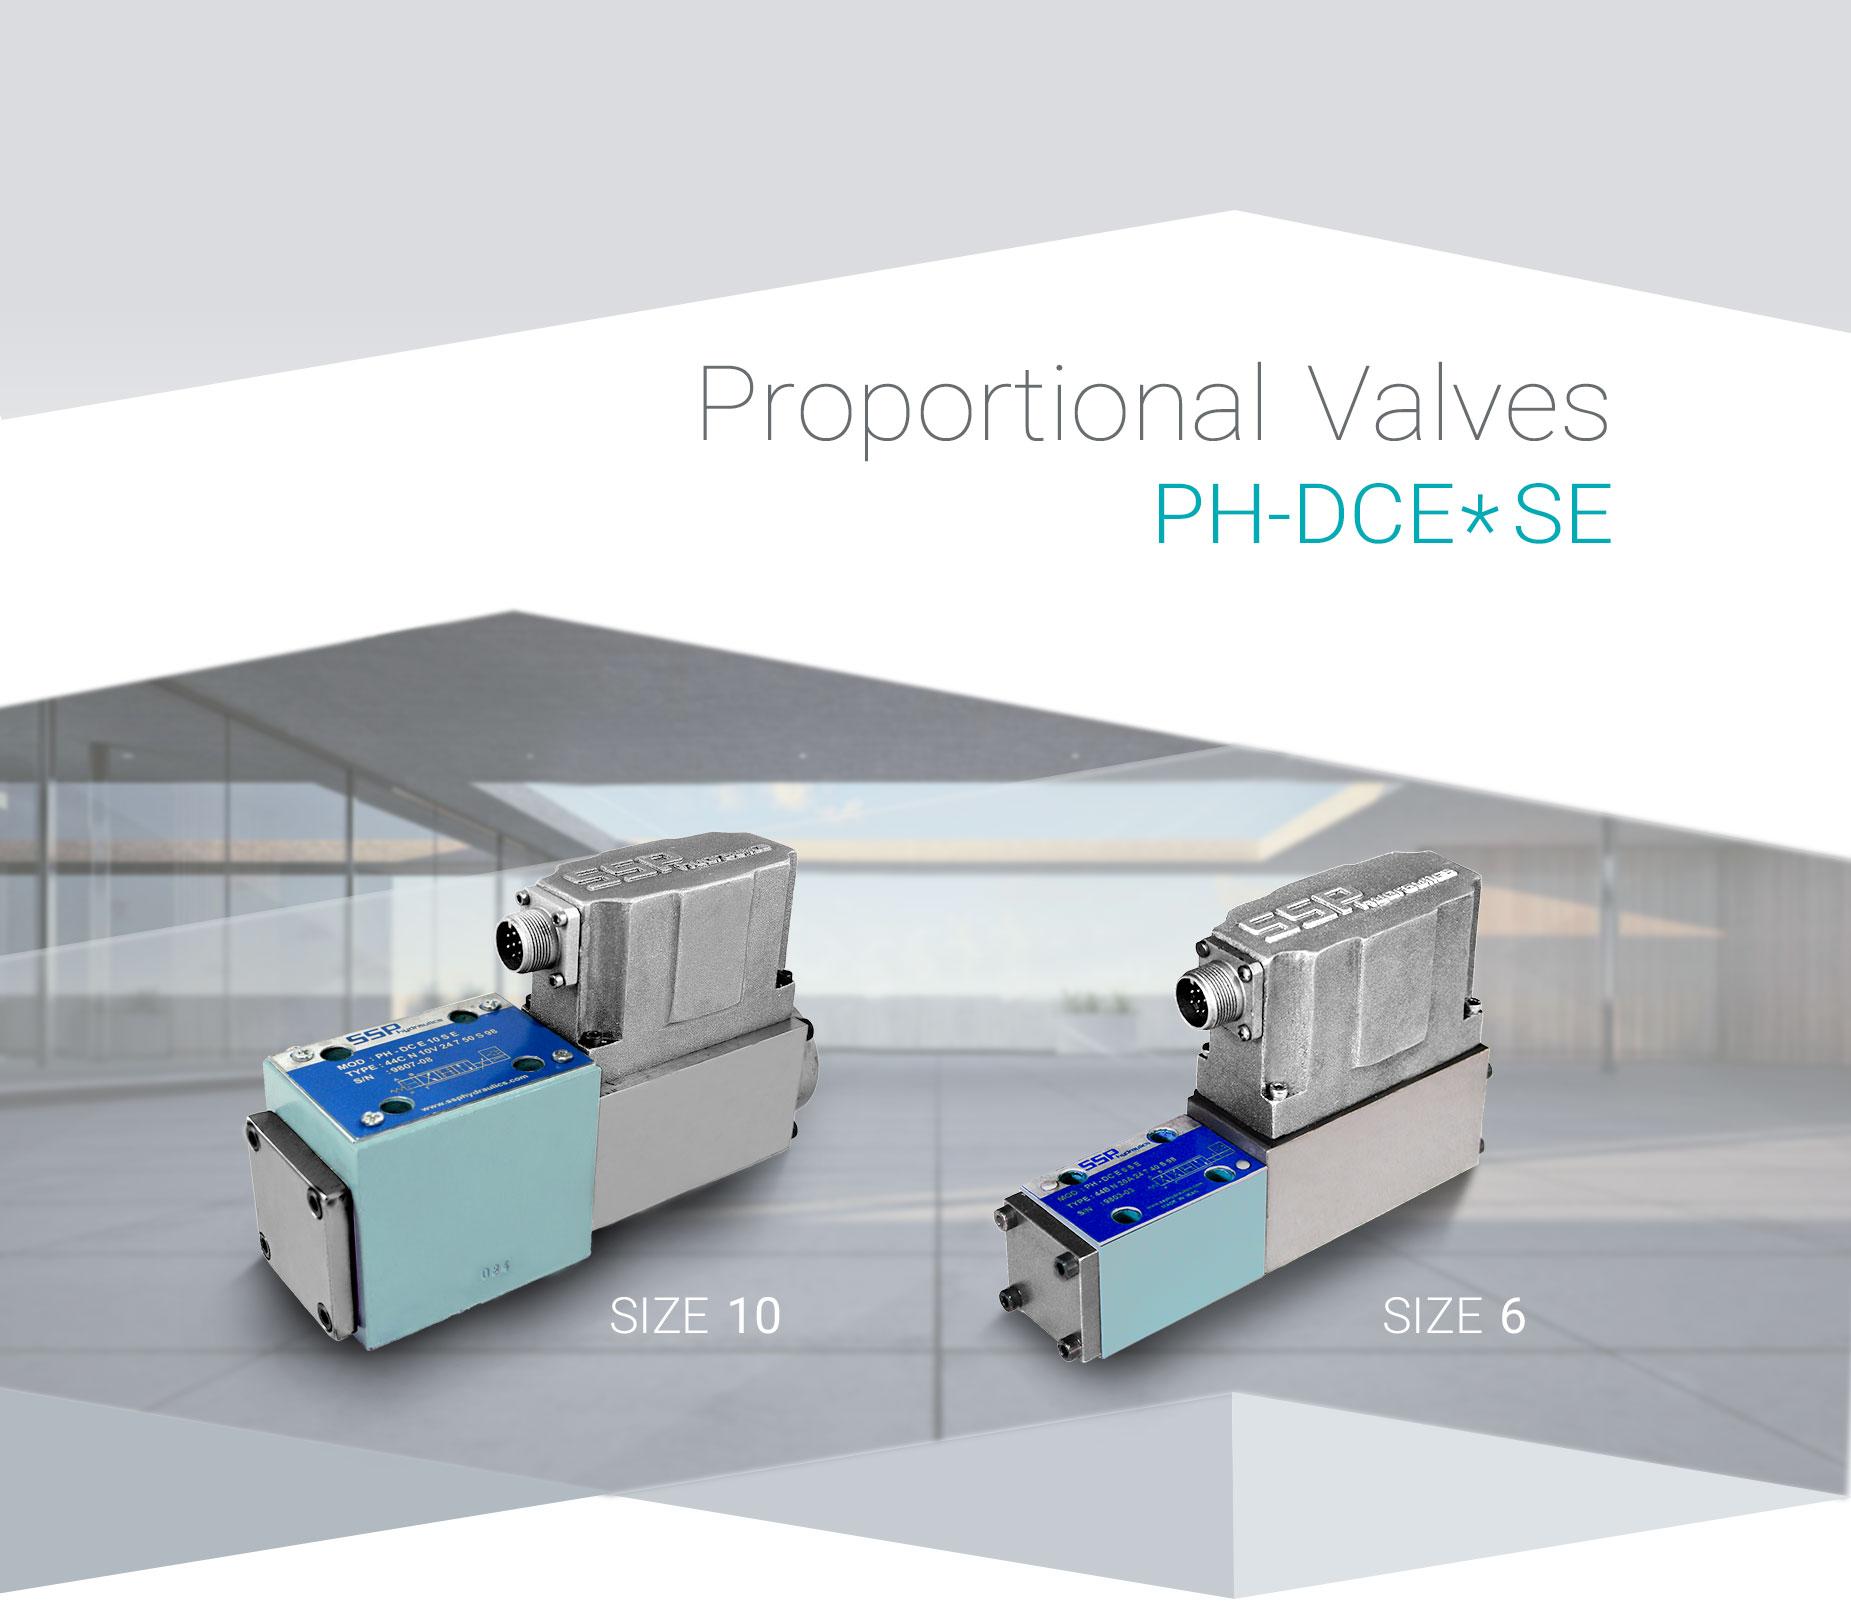 PH-DCE10SE-(1)